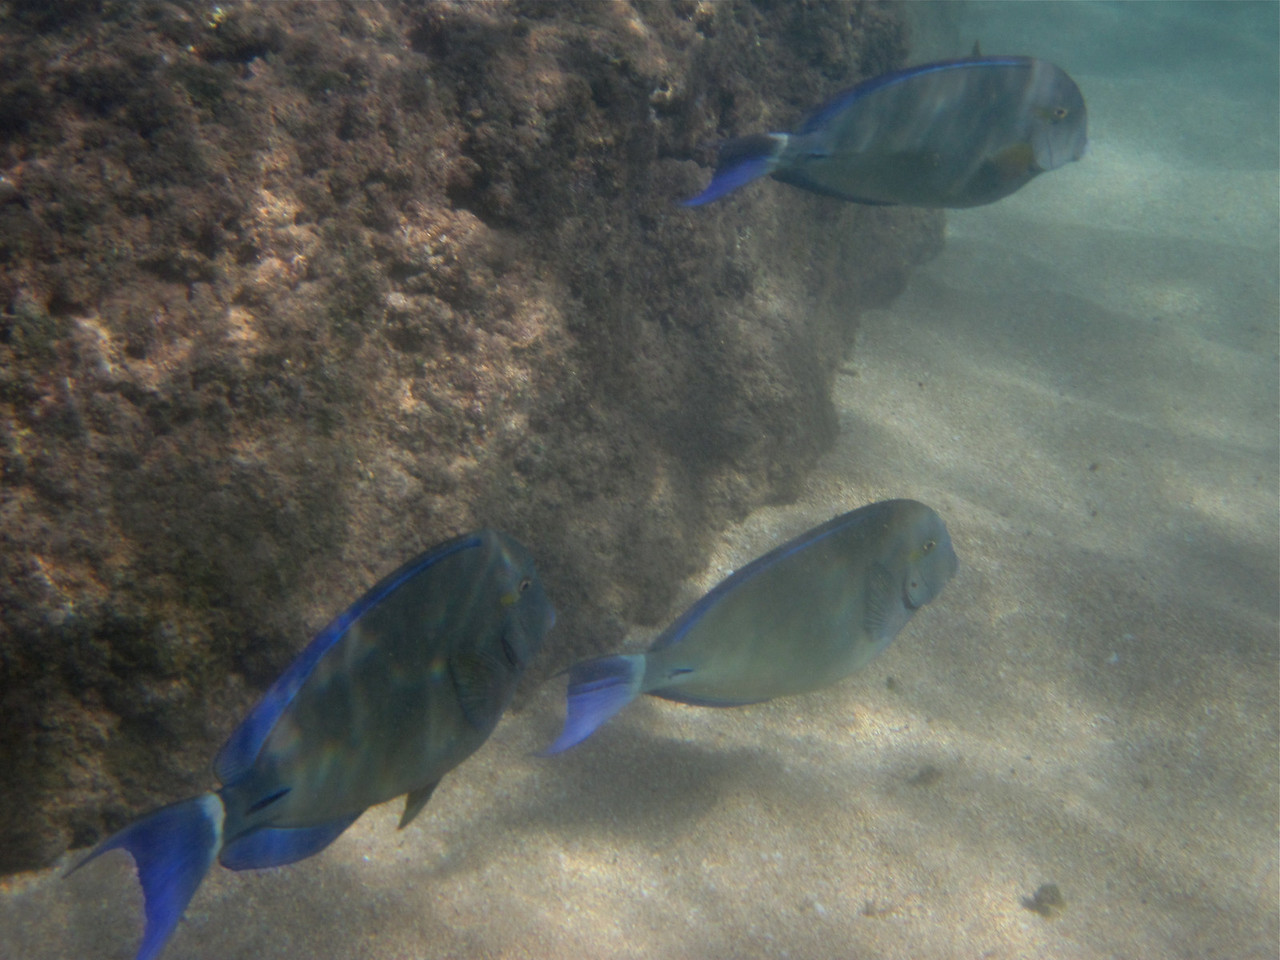 Ringtail surgeonfish (Acanthurus blochii)